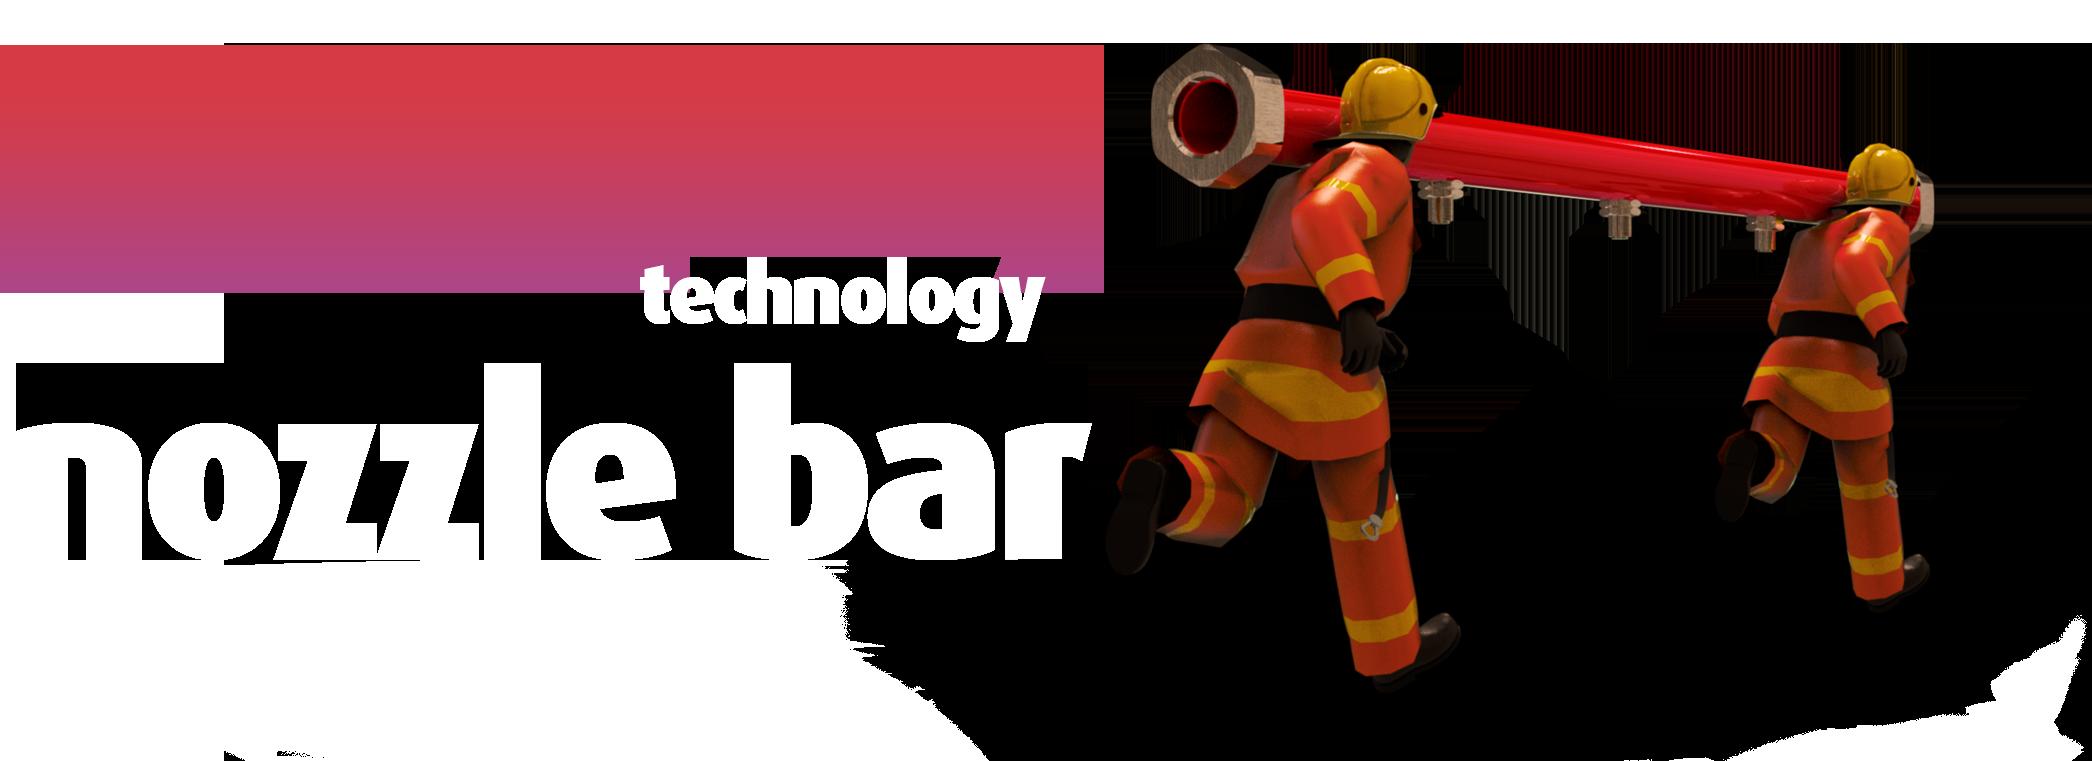 fire suppression systems - protecfire fine-spray technology nozzle bar